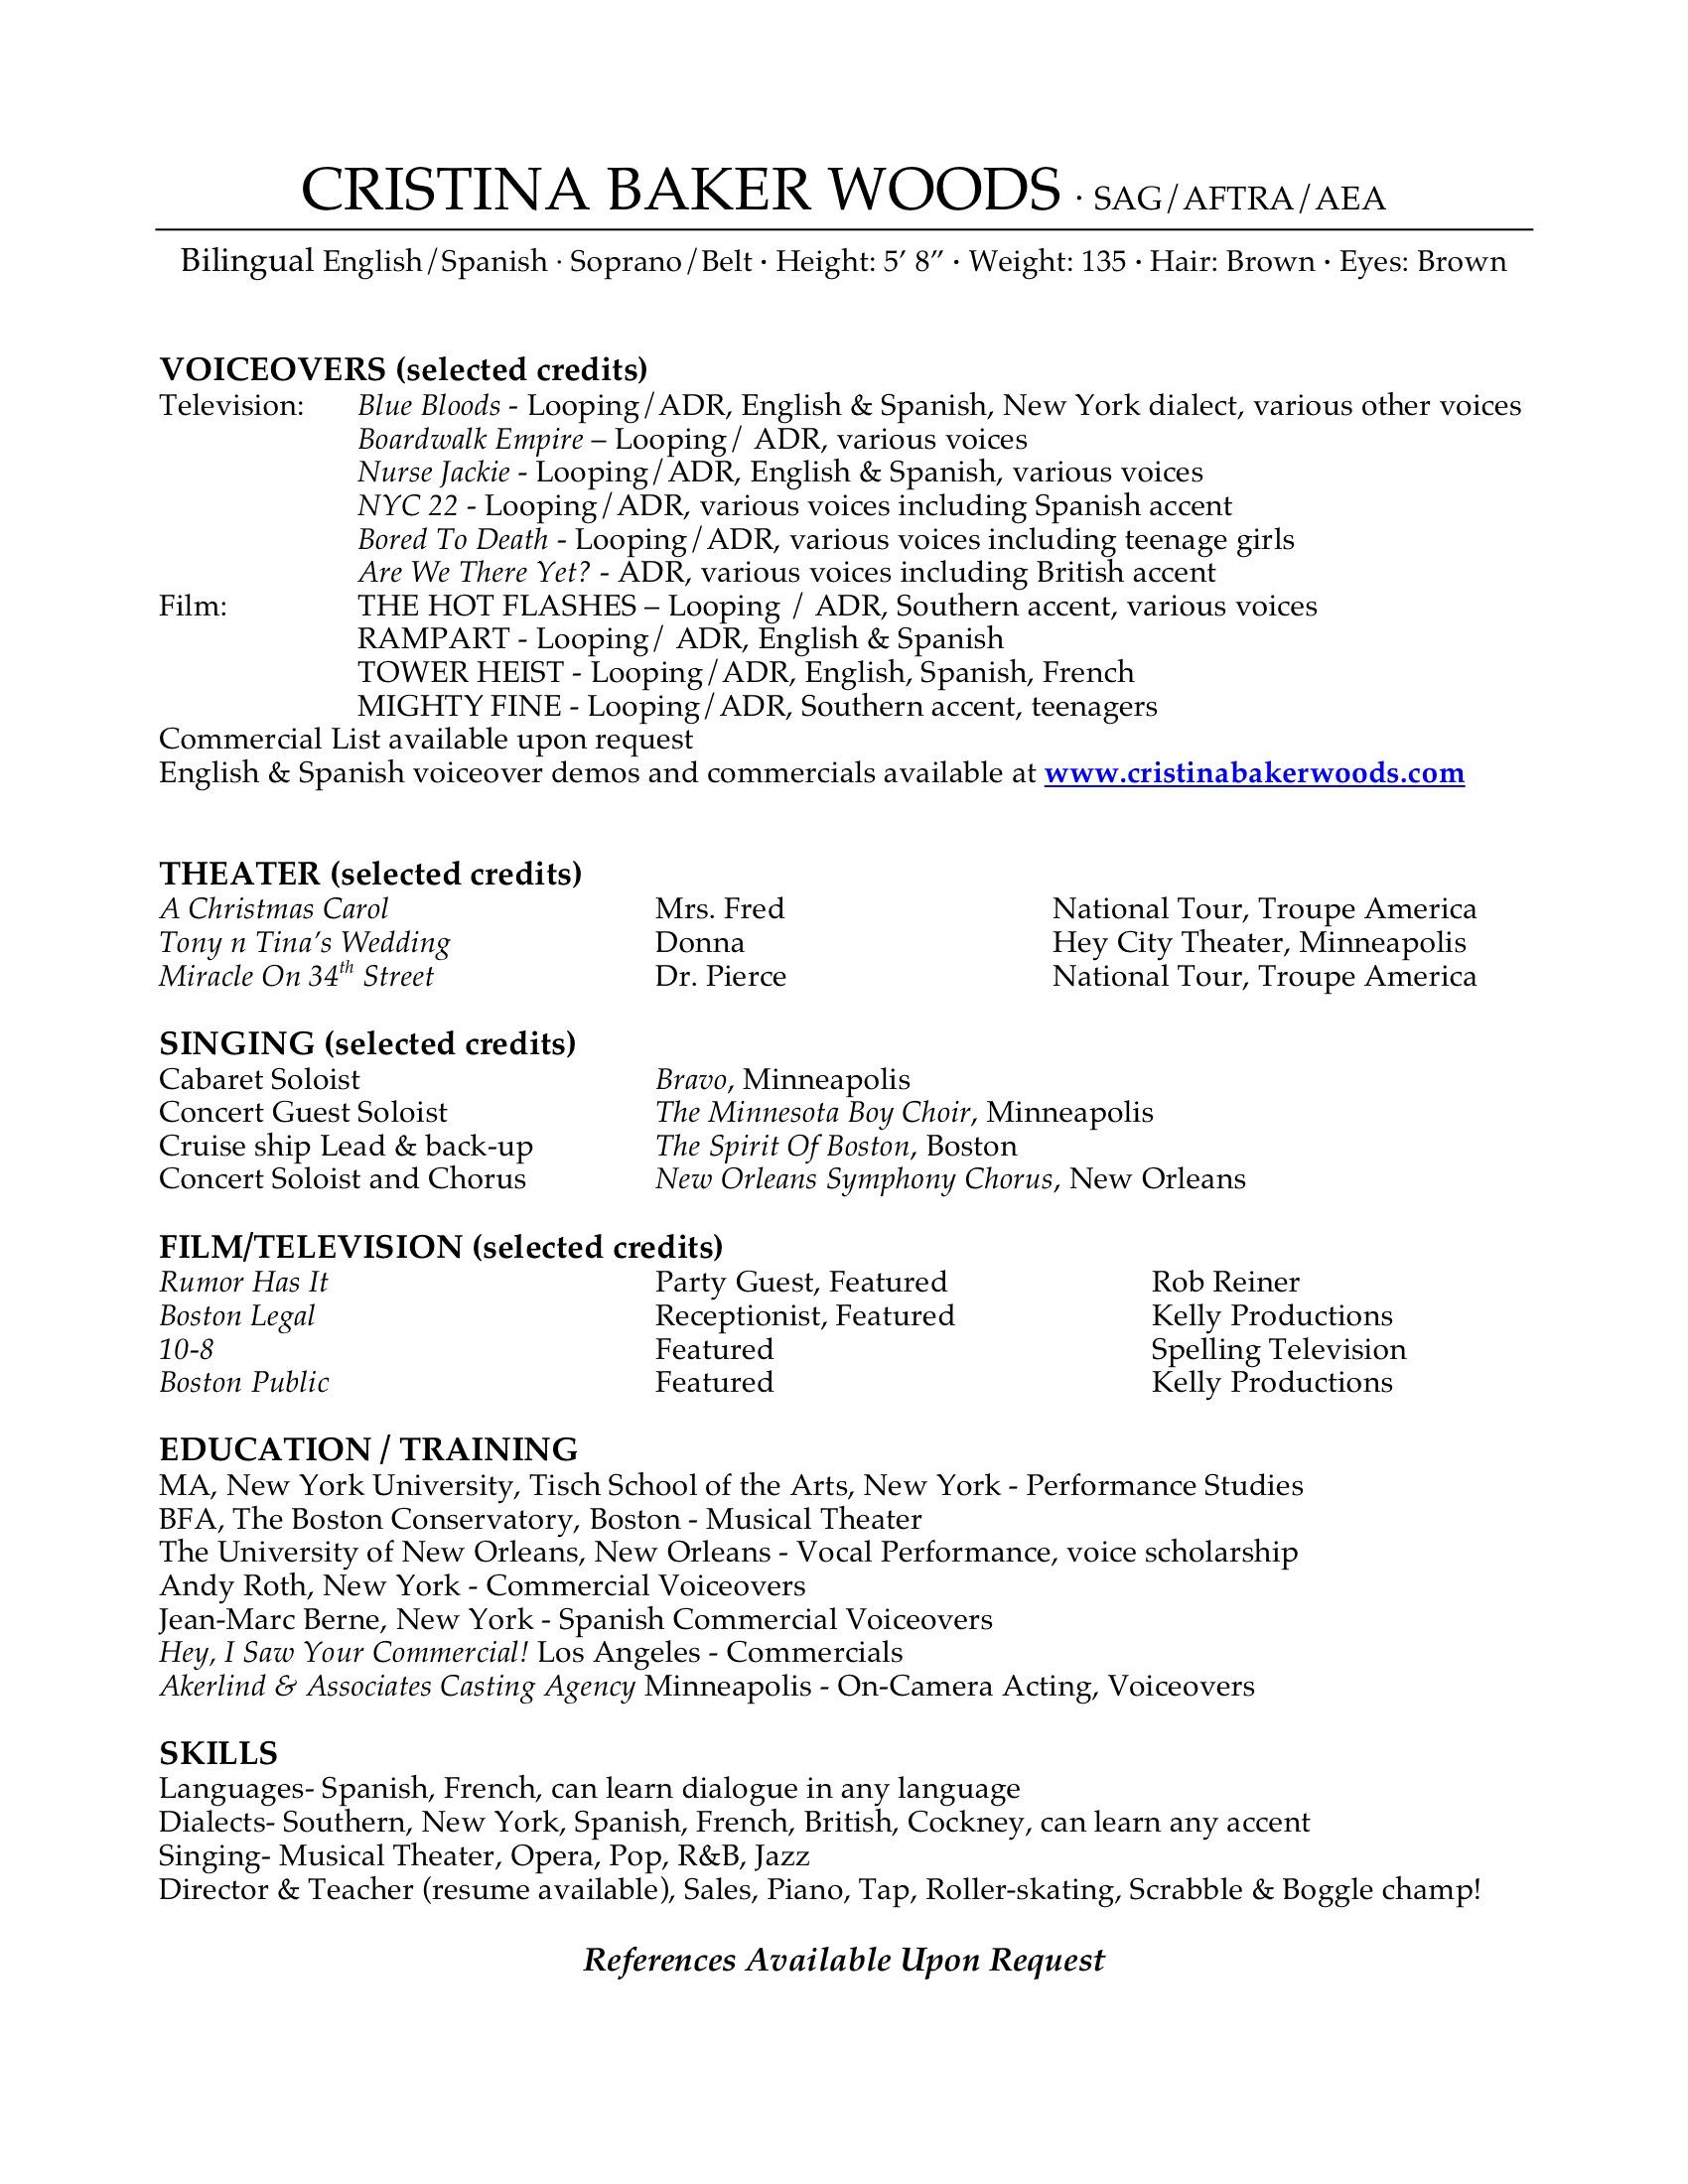 sample voice artist resume